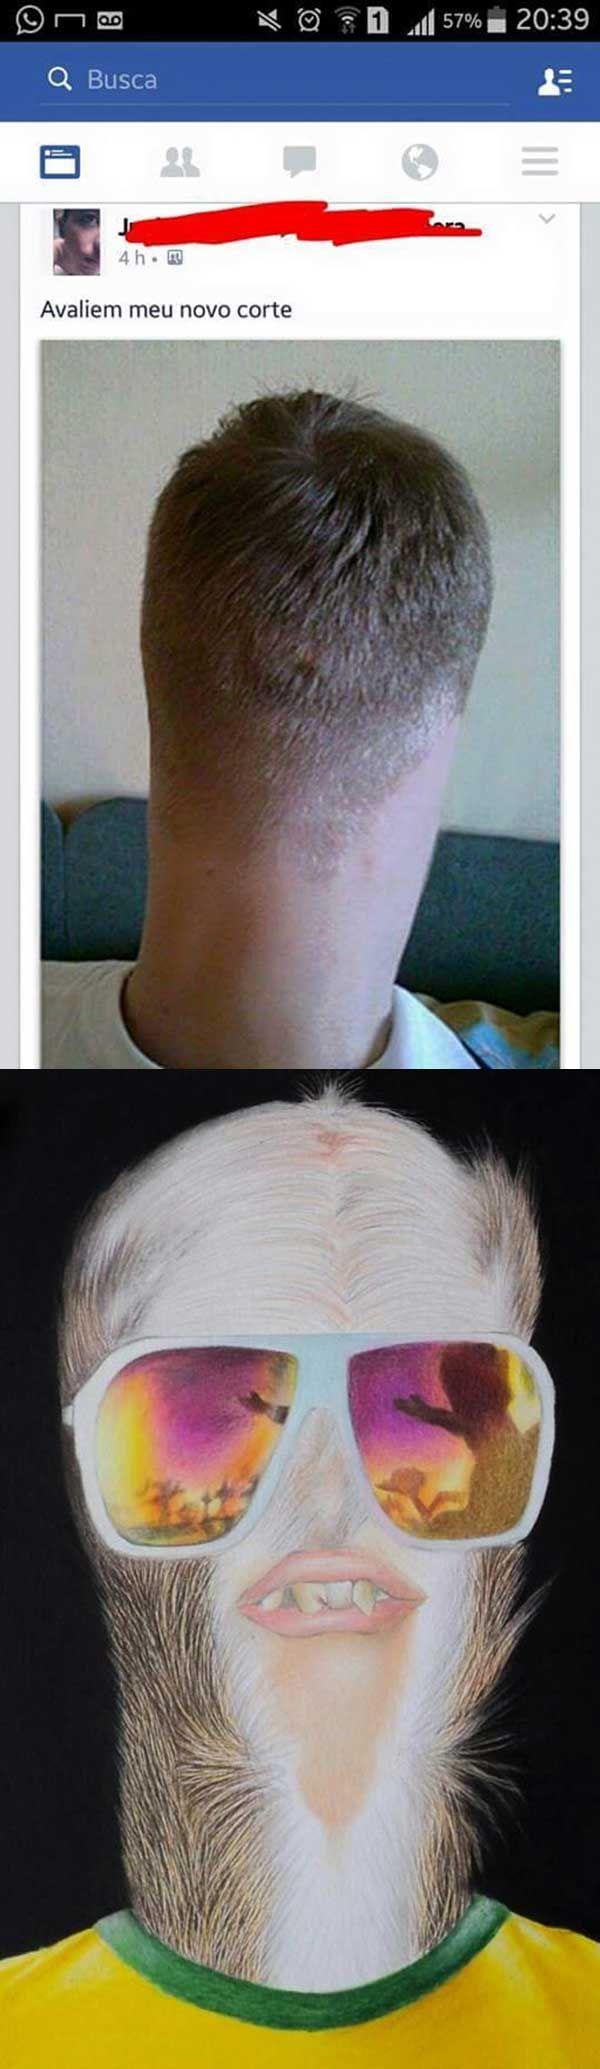 Novo corte de cabelo  kkkkkkkkkkkkkkkkkkkkkkkkkkkkkkkkkkkkkkk